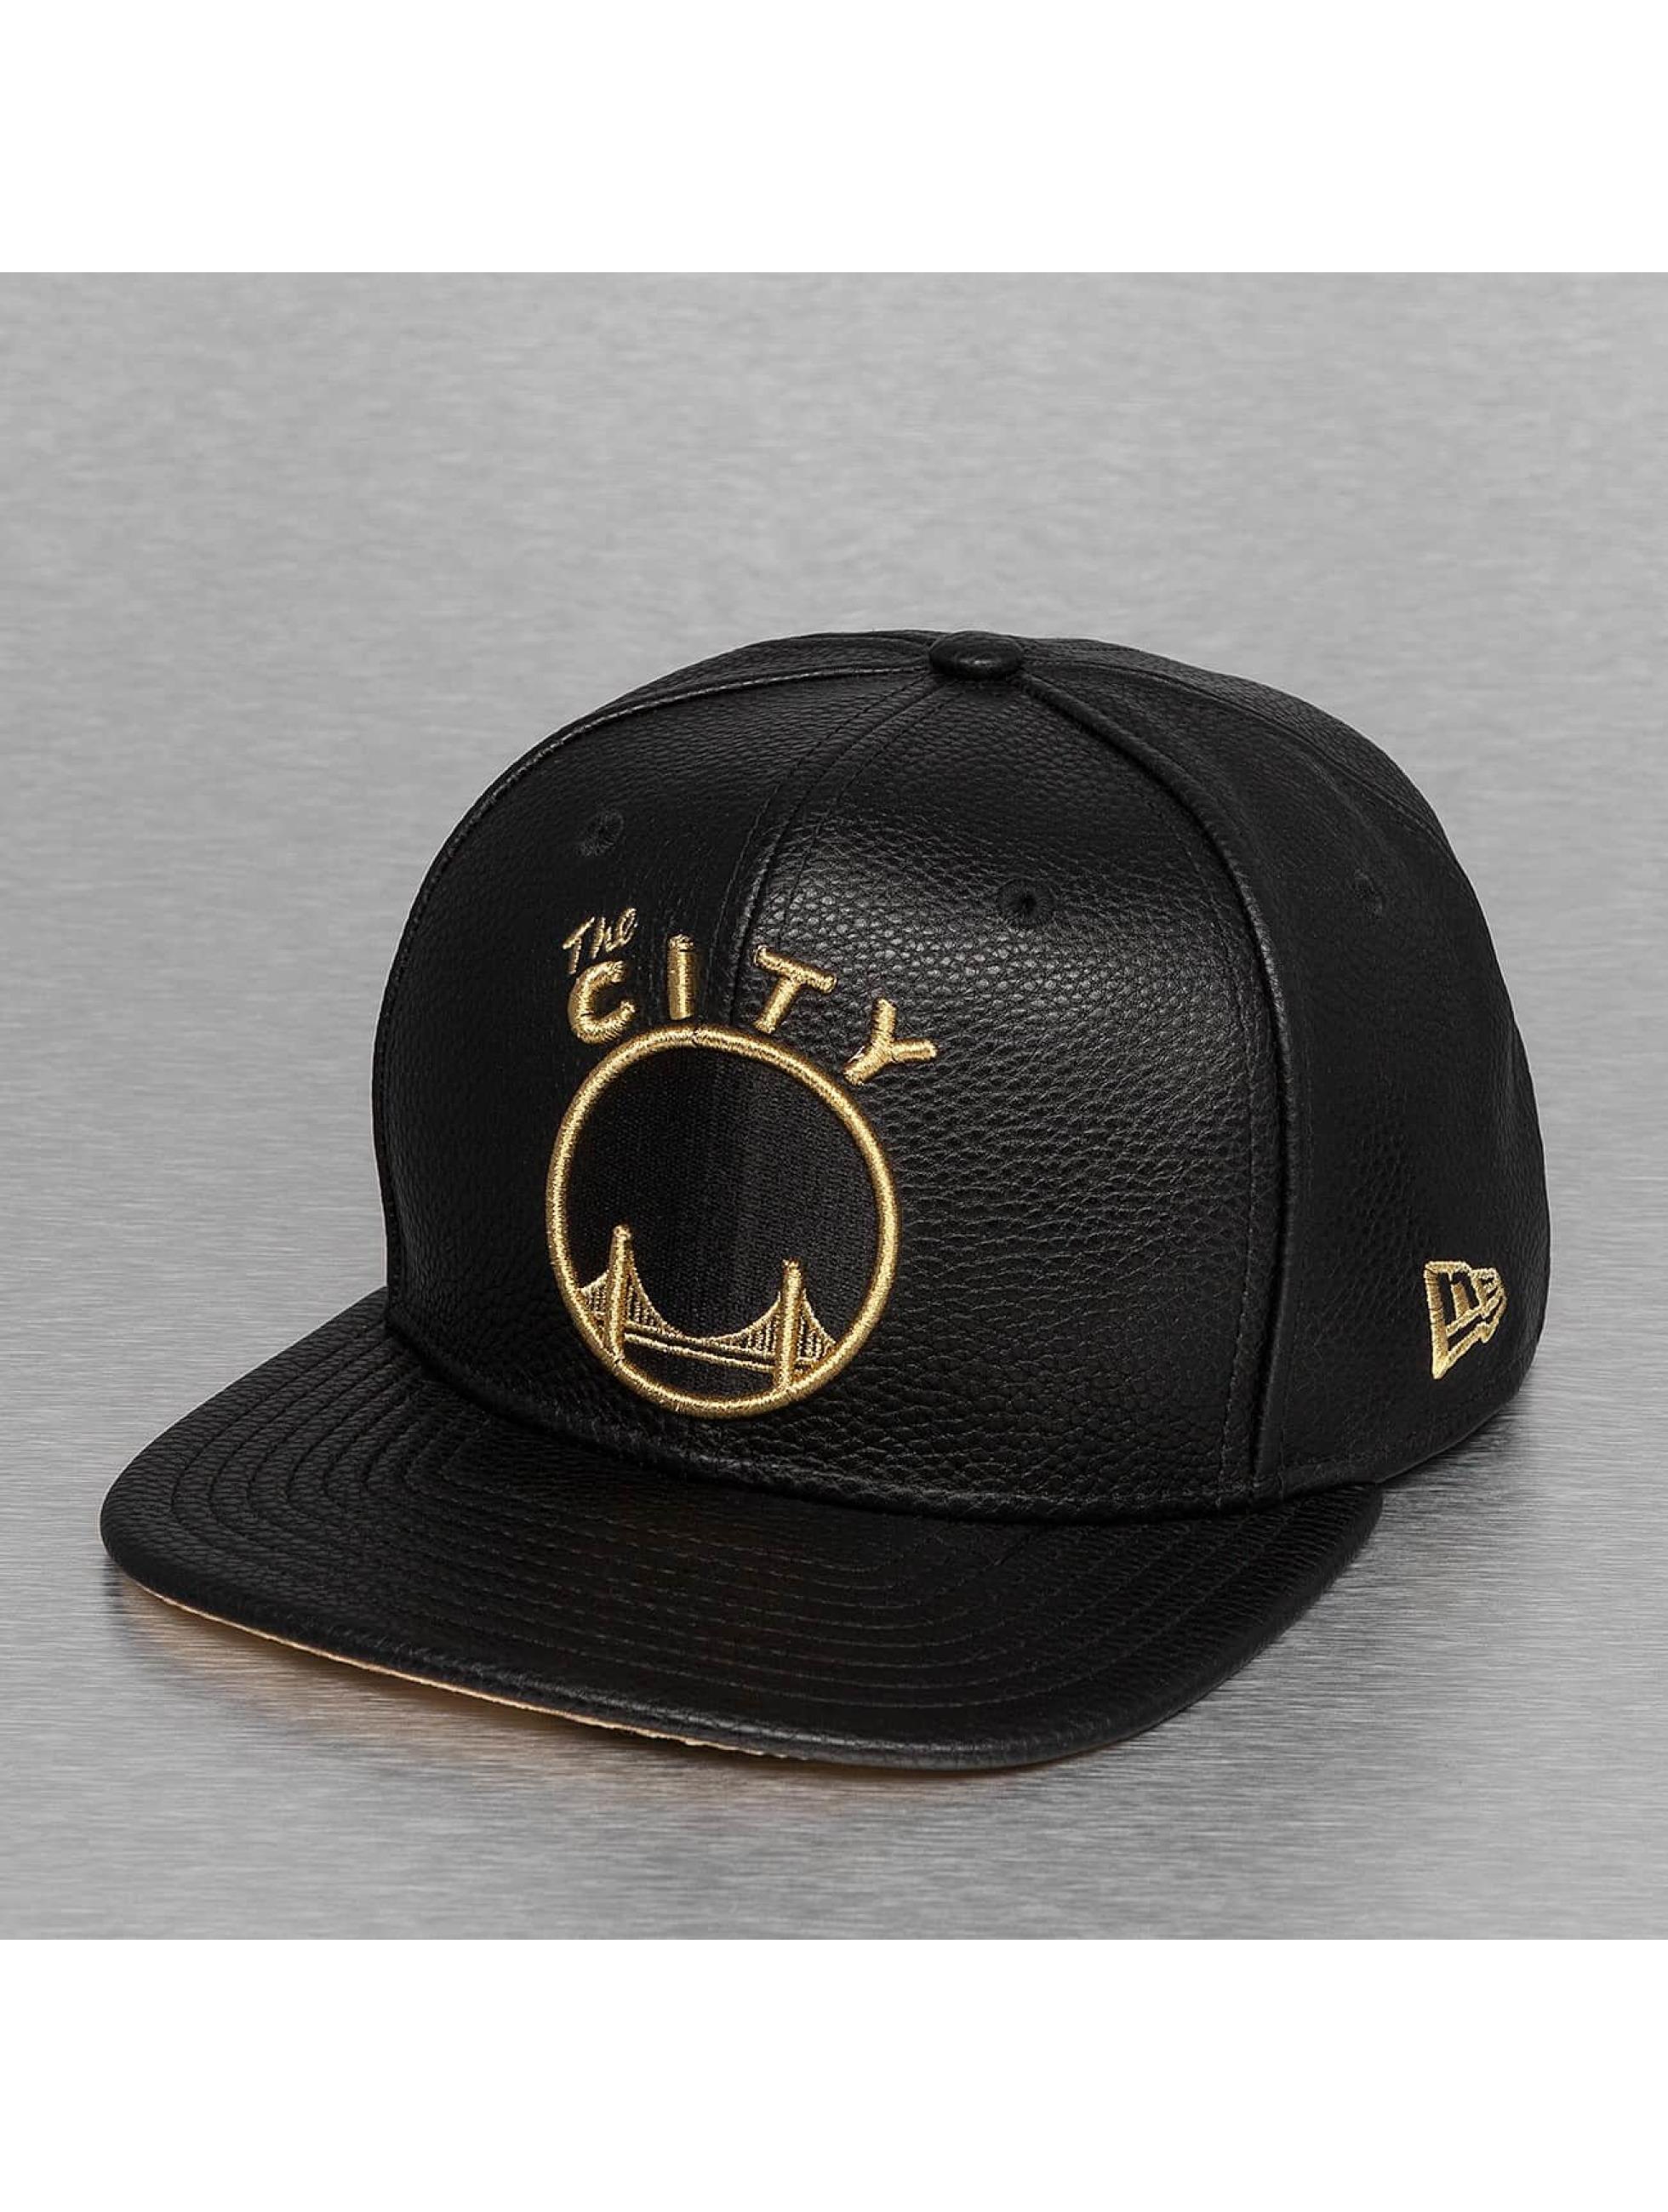 New Era Snapback Cap Golden State Warriors 9Fifty black